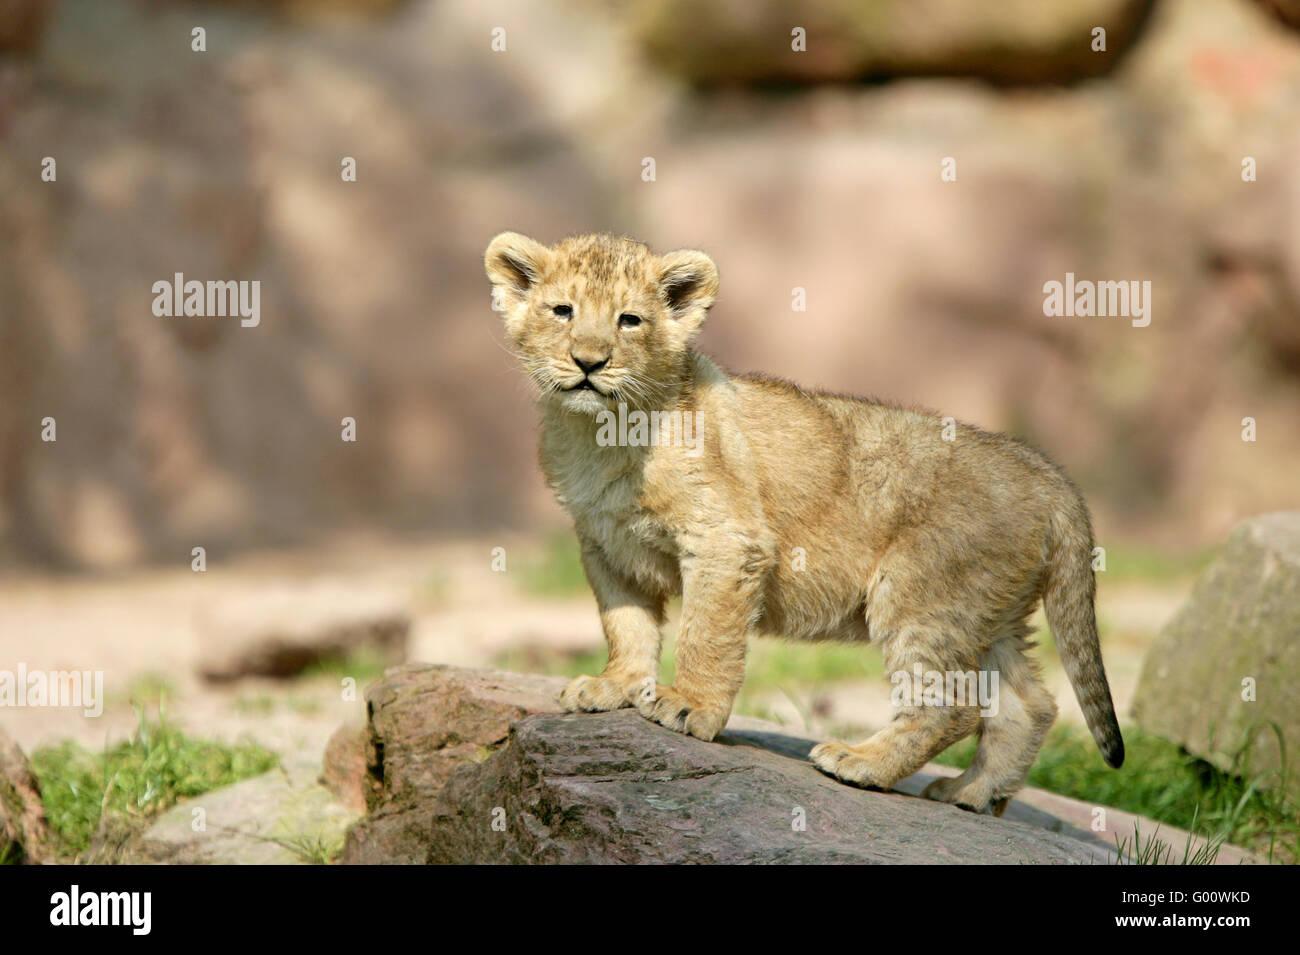 asiatic Lion - Stock Image